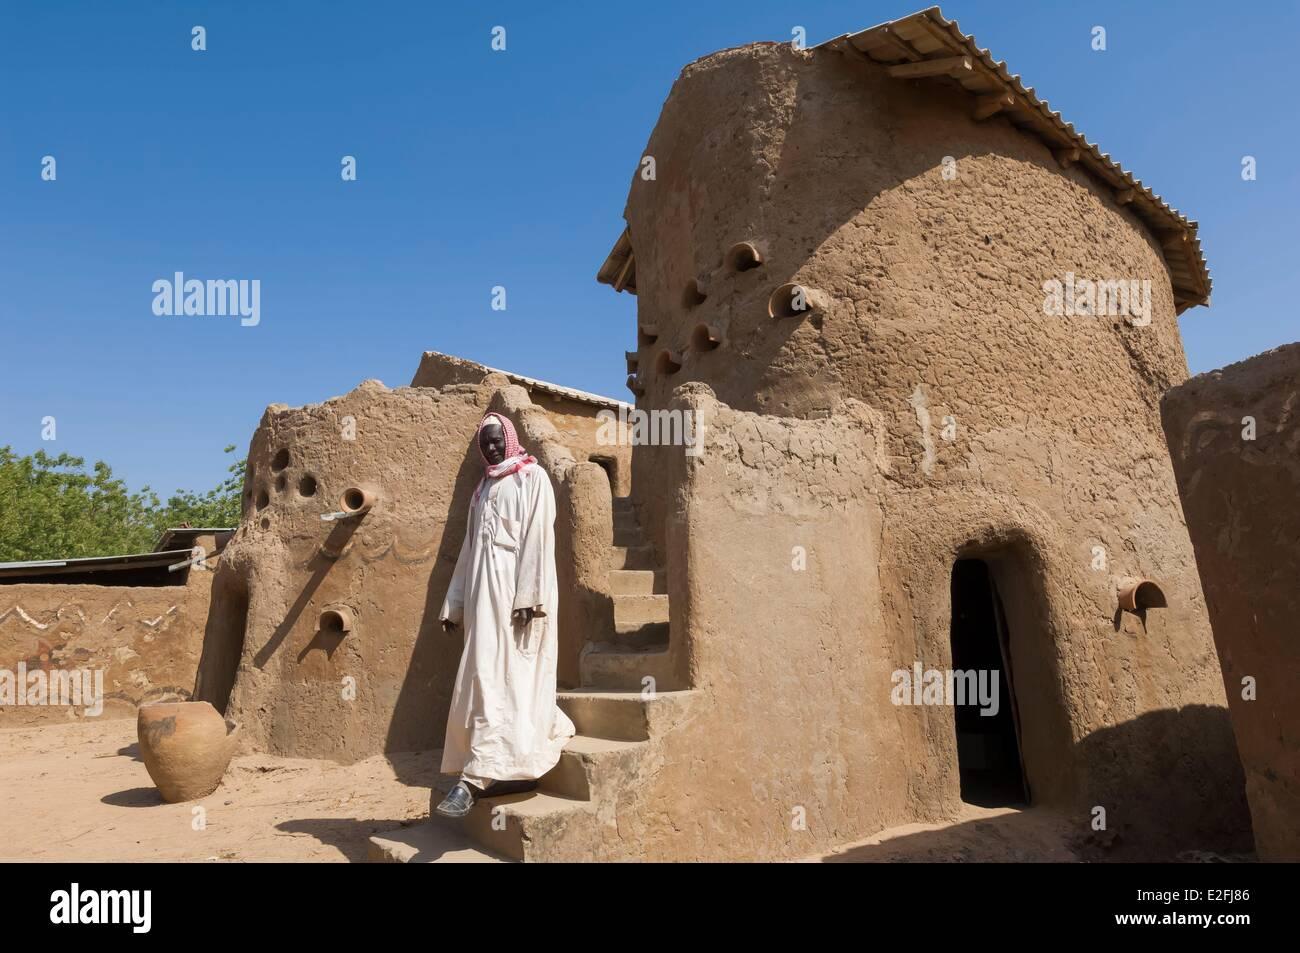 Chad, Sahel, Gaoui, adobe palcxe of the Sao sultan - Stock Image